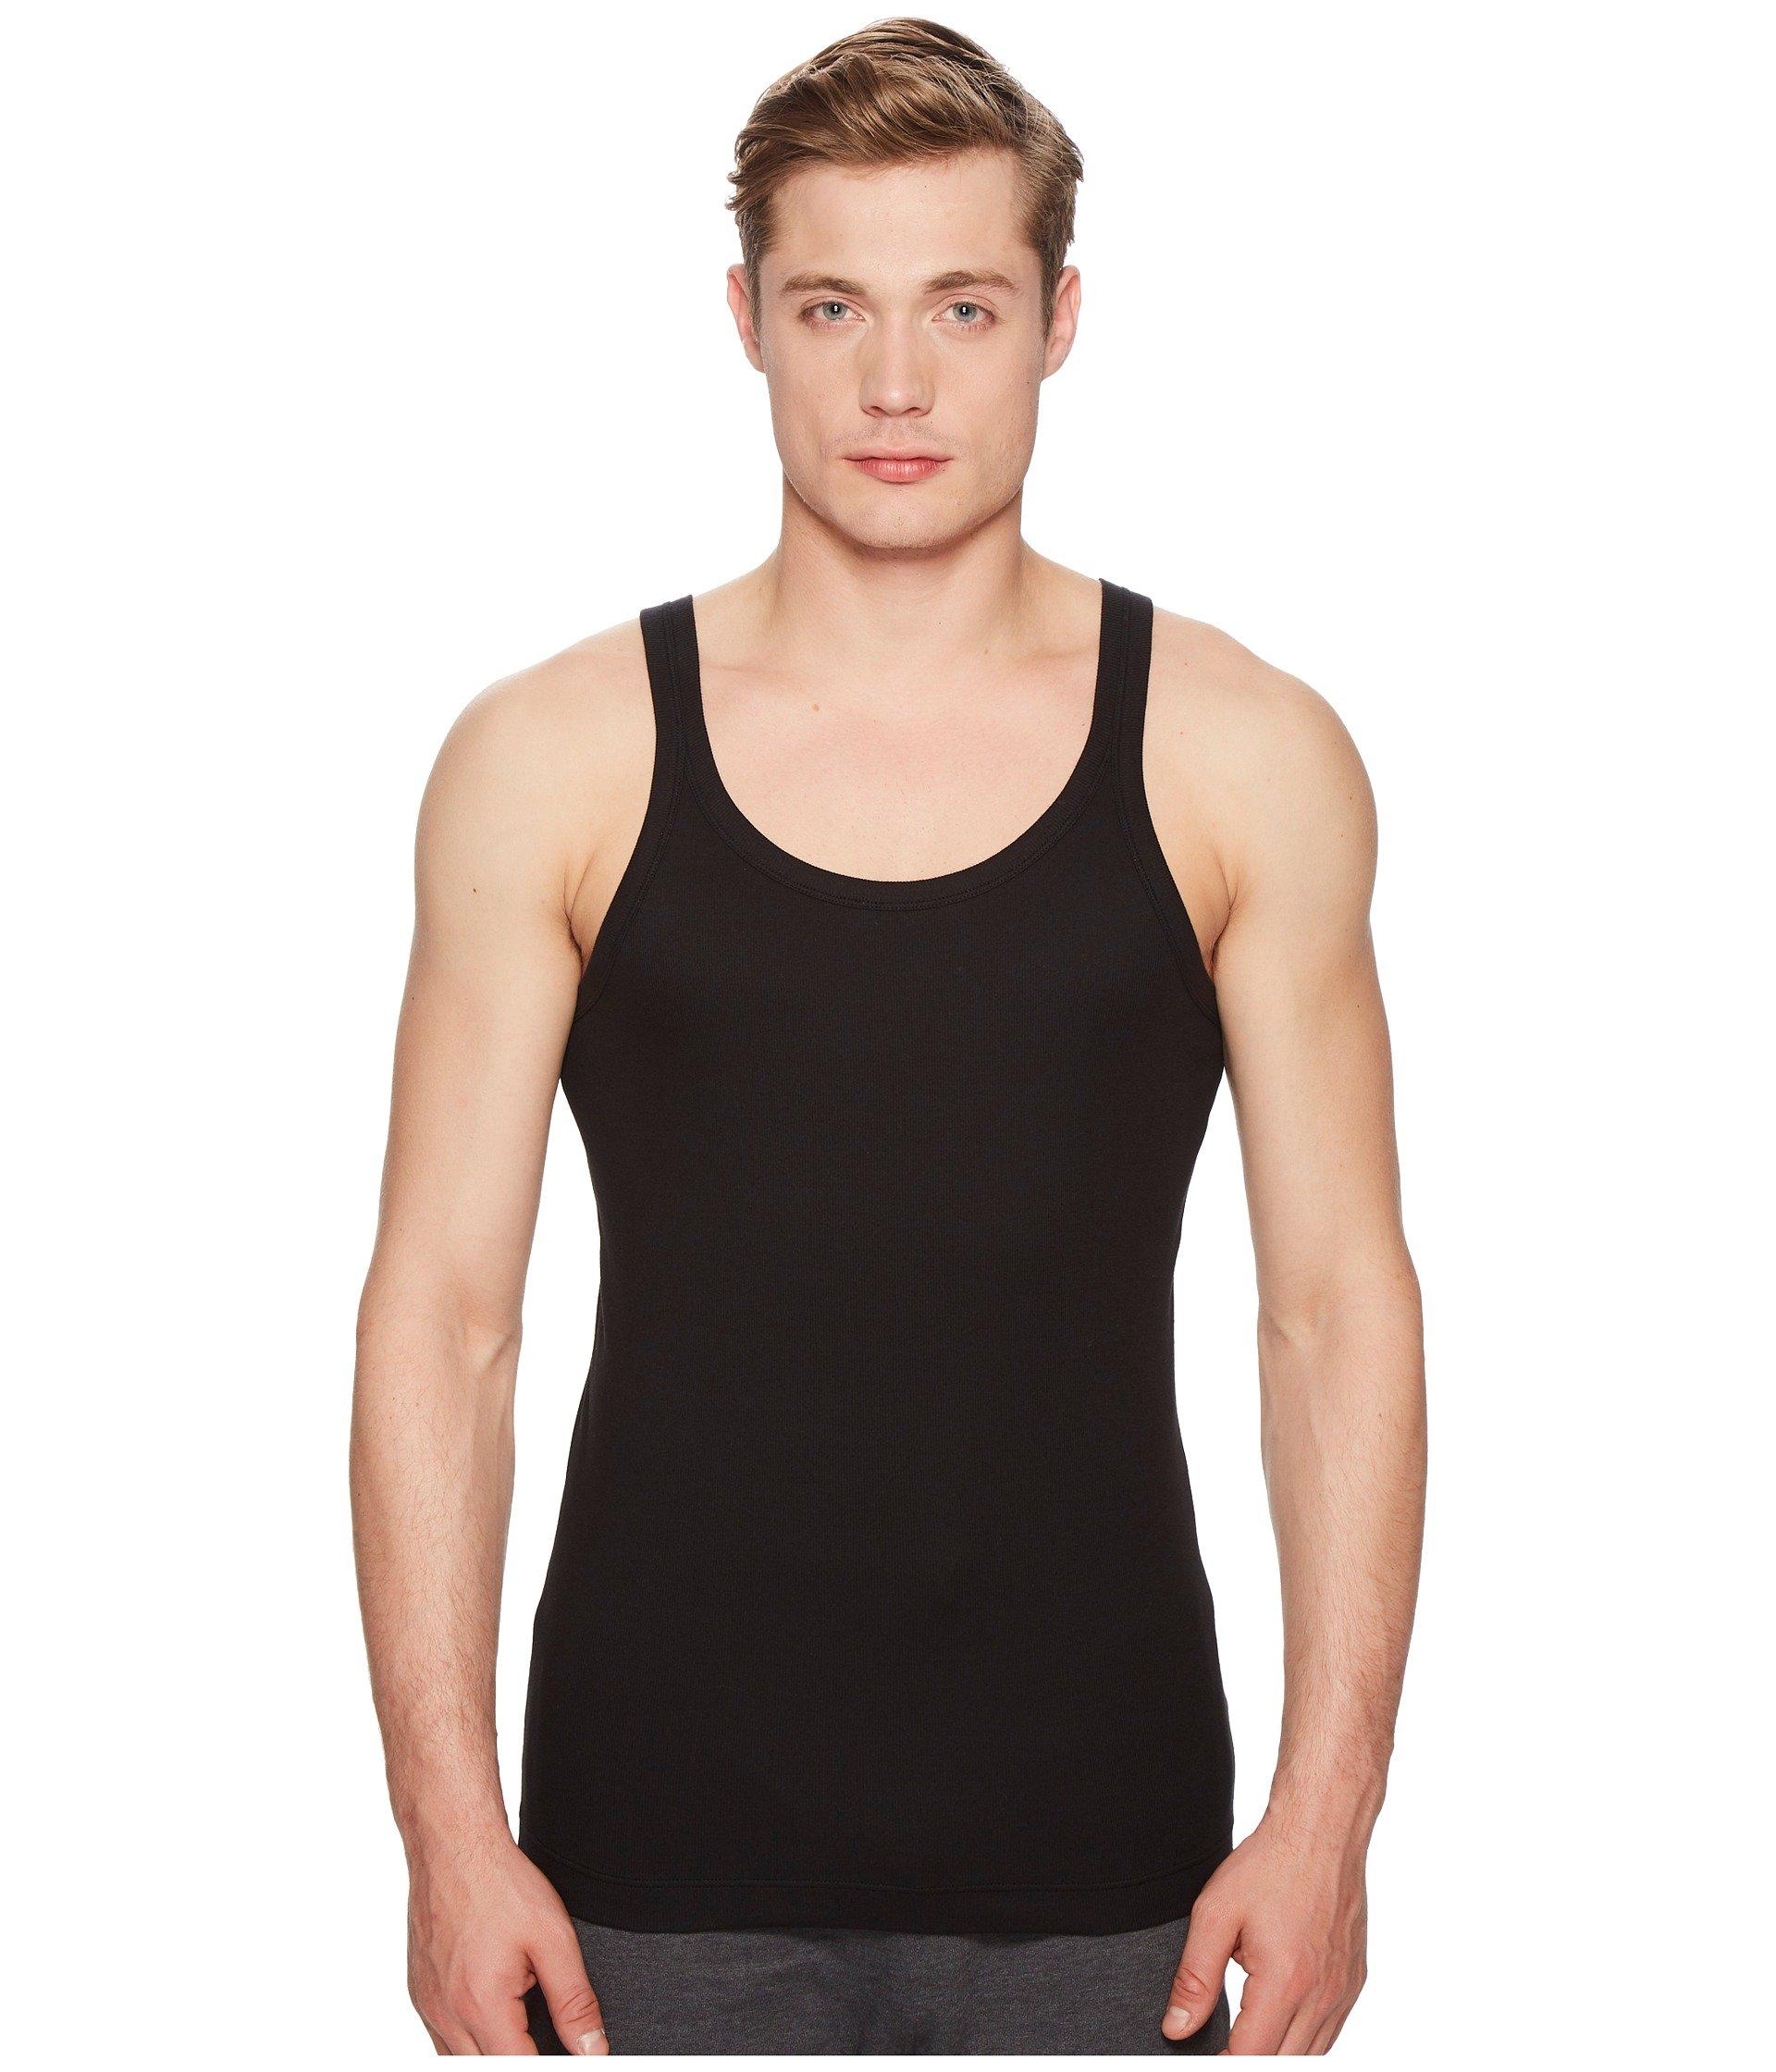 Camiseta sin Manga para Hombre Dolce andamp; Gabbana Cotton Stretch Marcello t-shirt Top  + Dolce & Gabbana en VeoyCompro.net